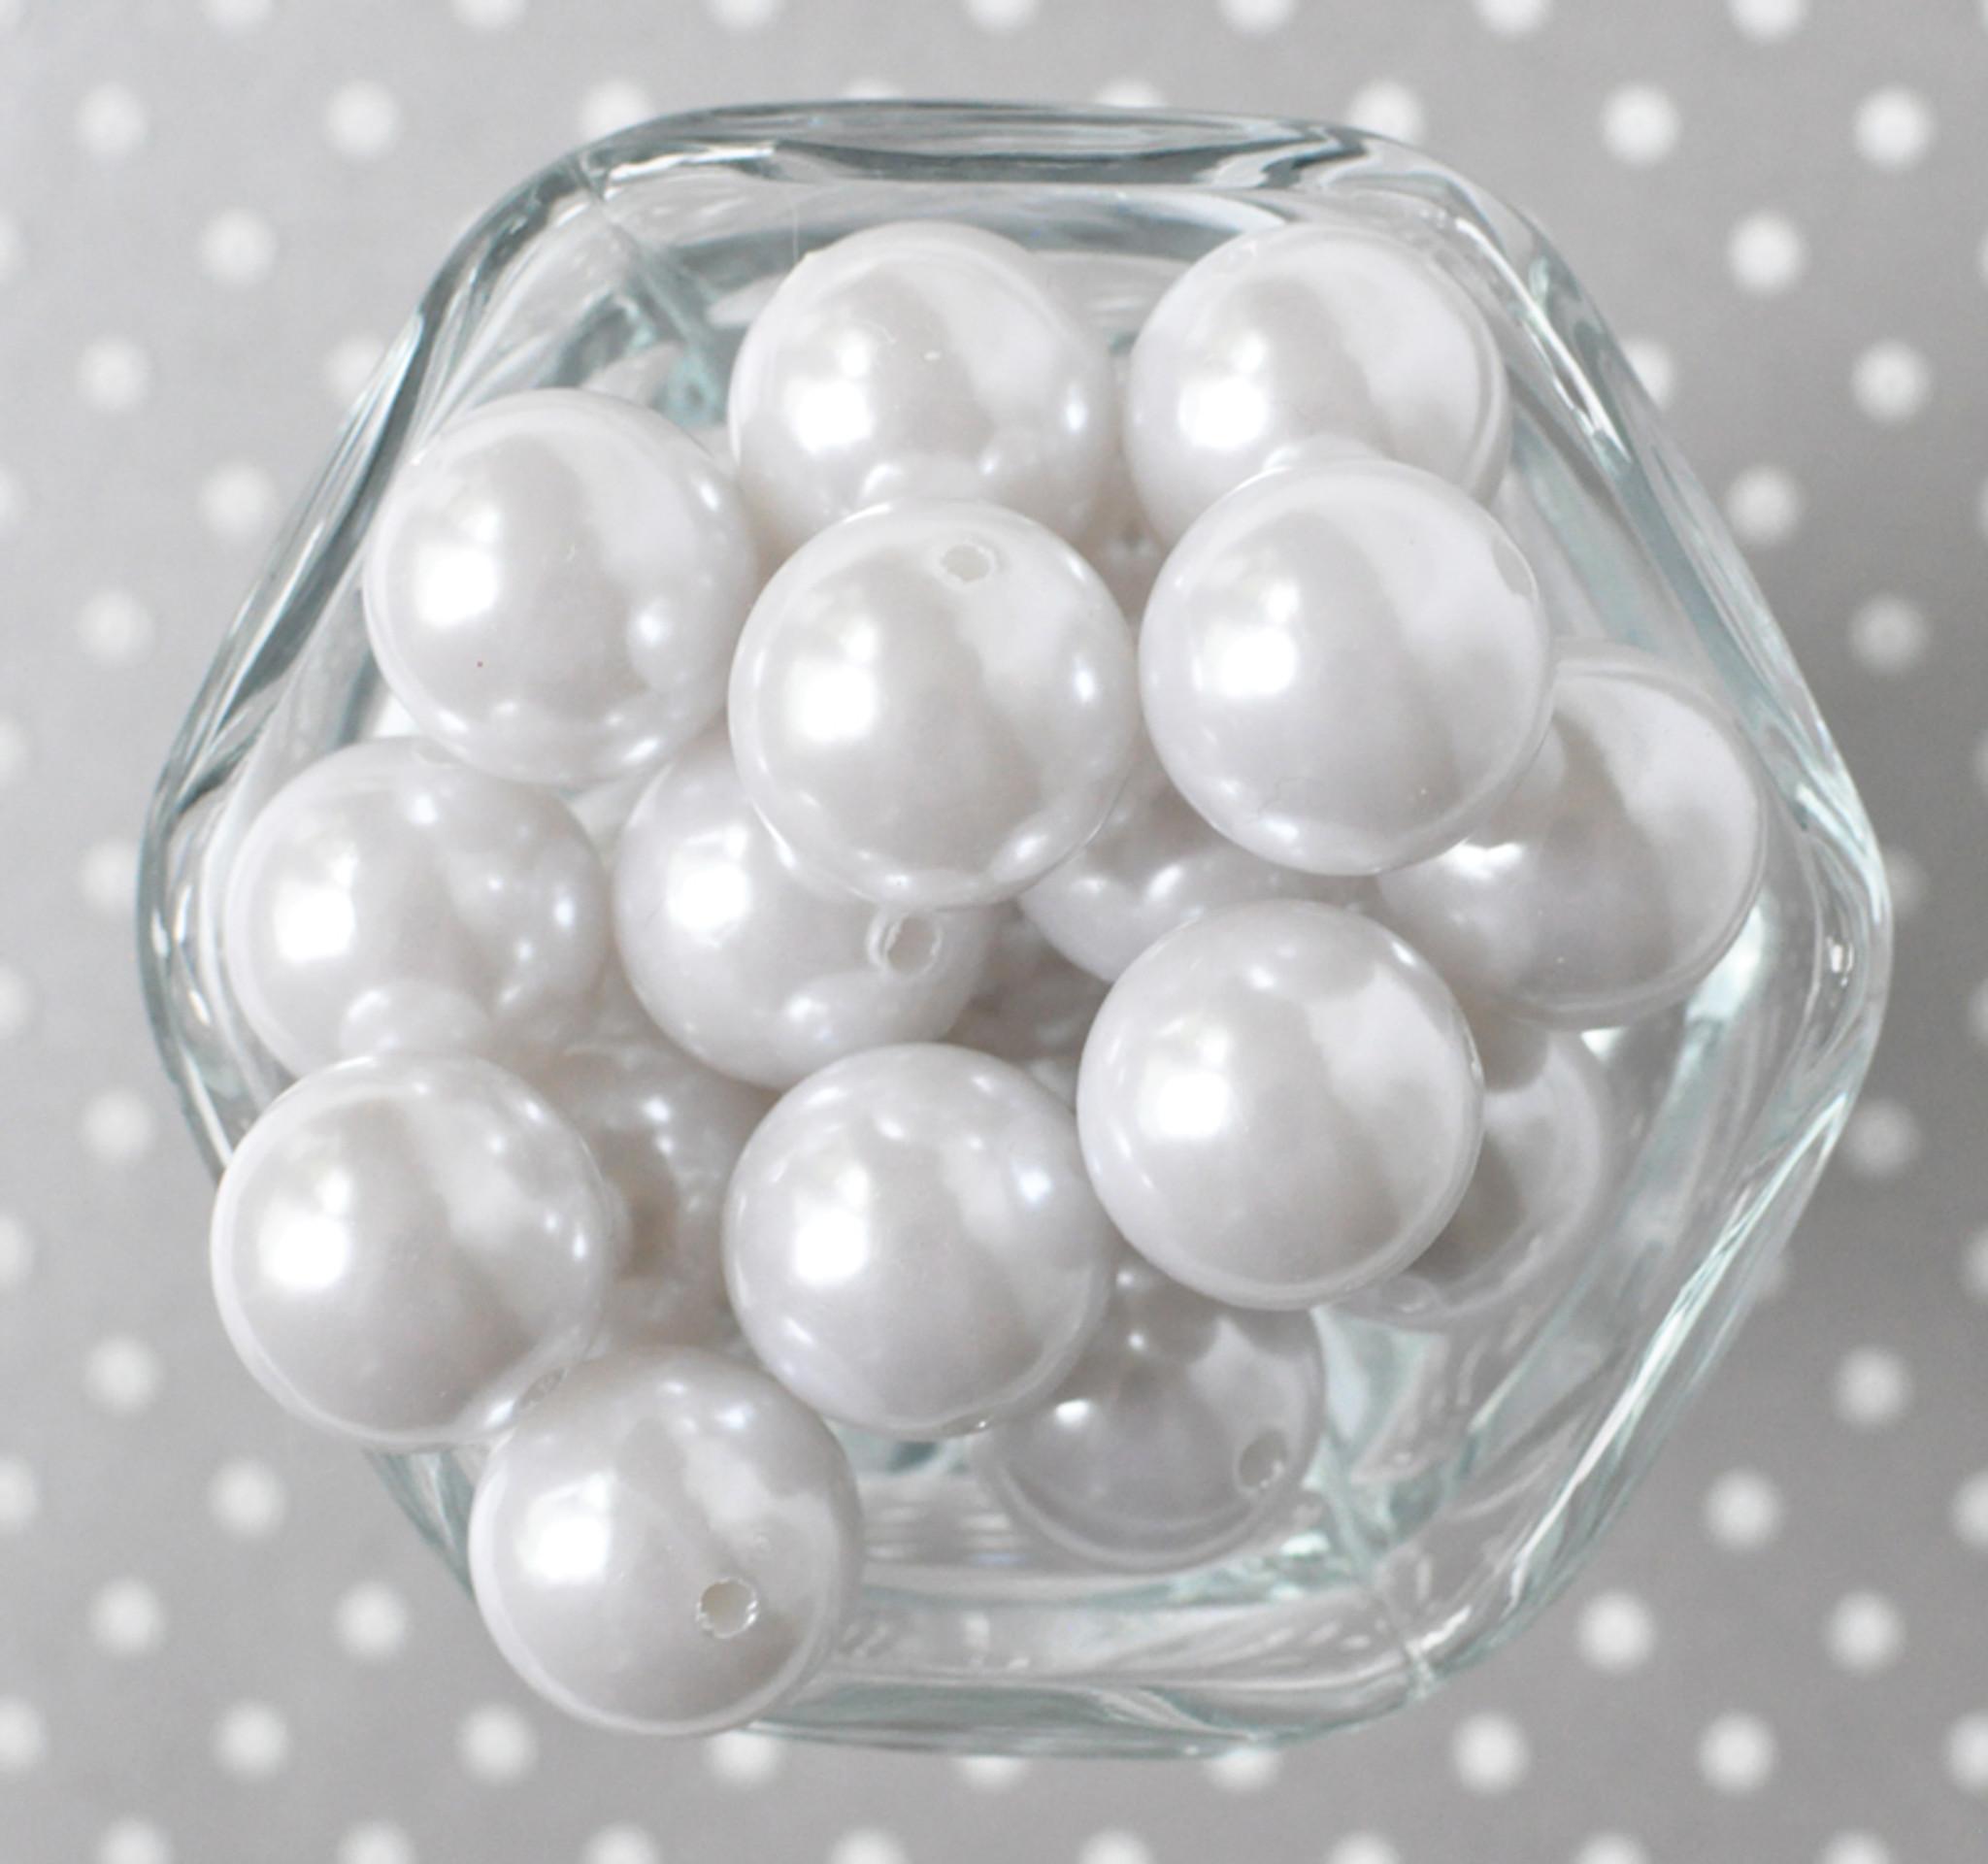 20mm White pearl bubblegum beads for DIY Children's jewelry supplies